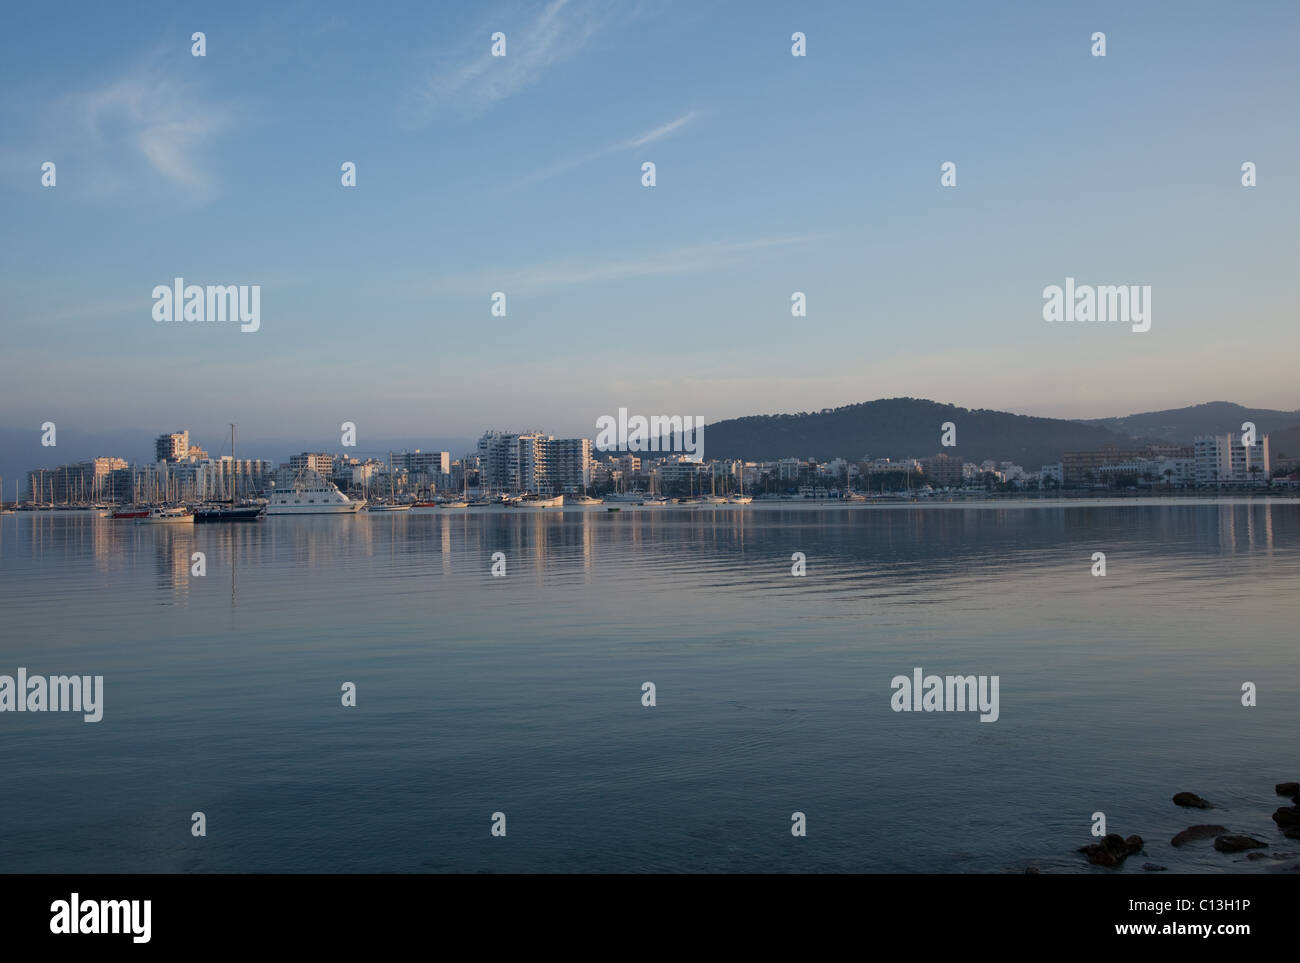 San Antonio in Ibiza at sunset - Stock Image